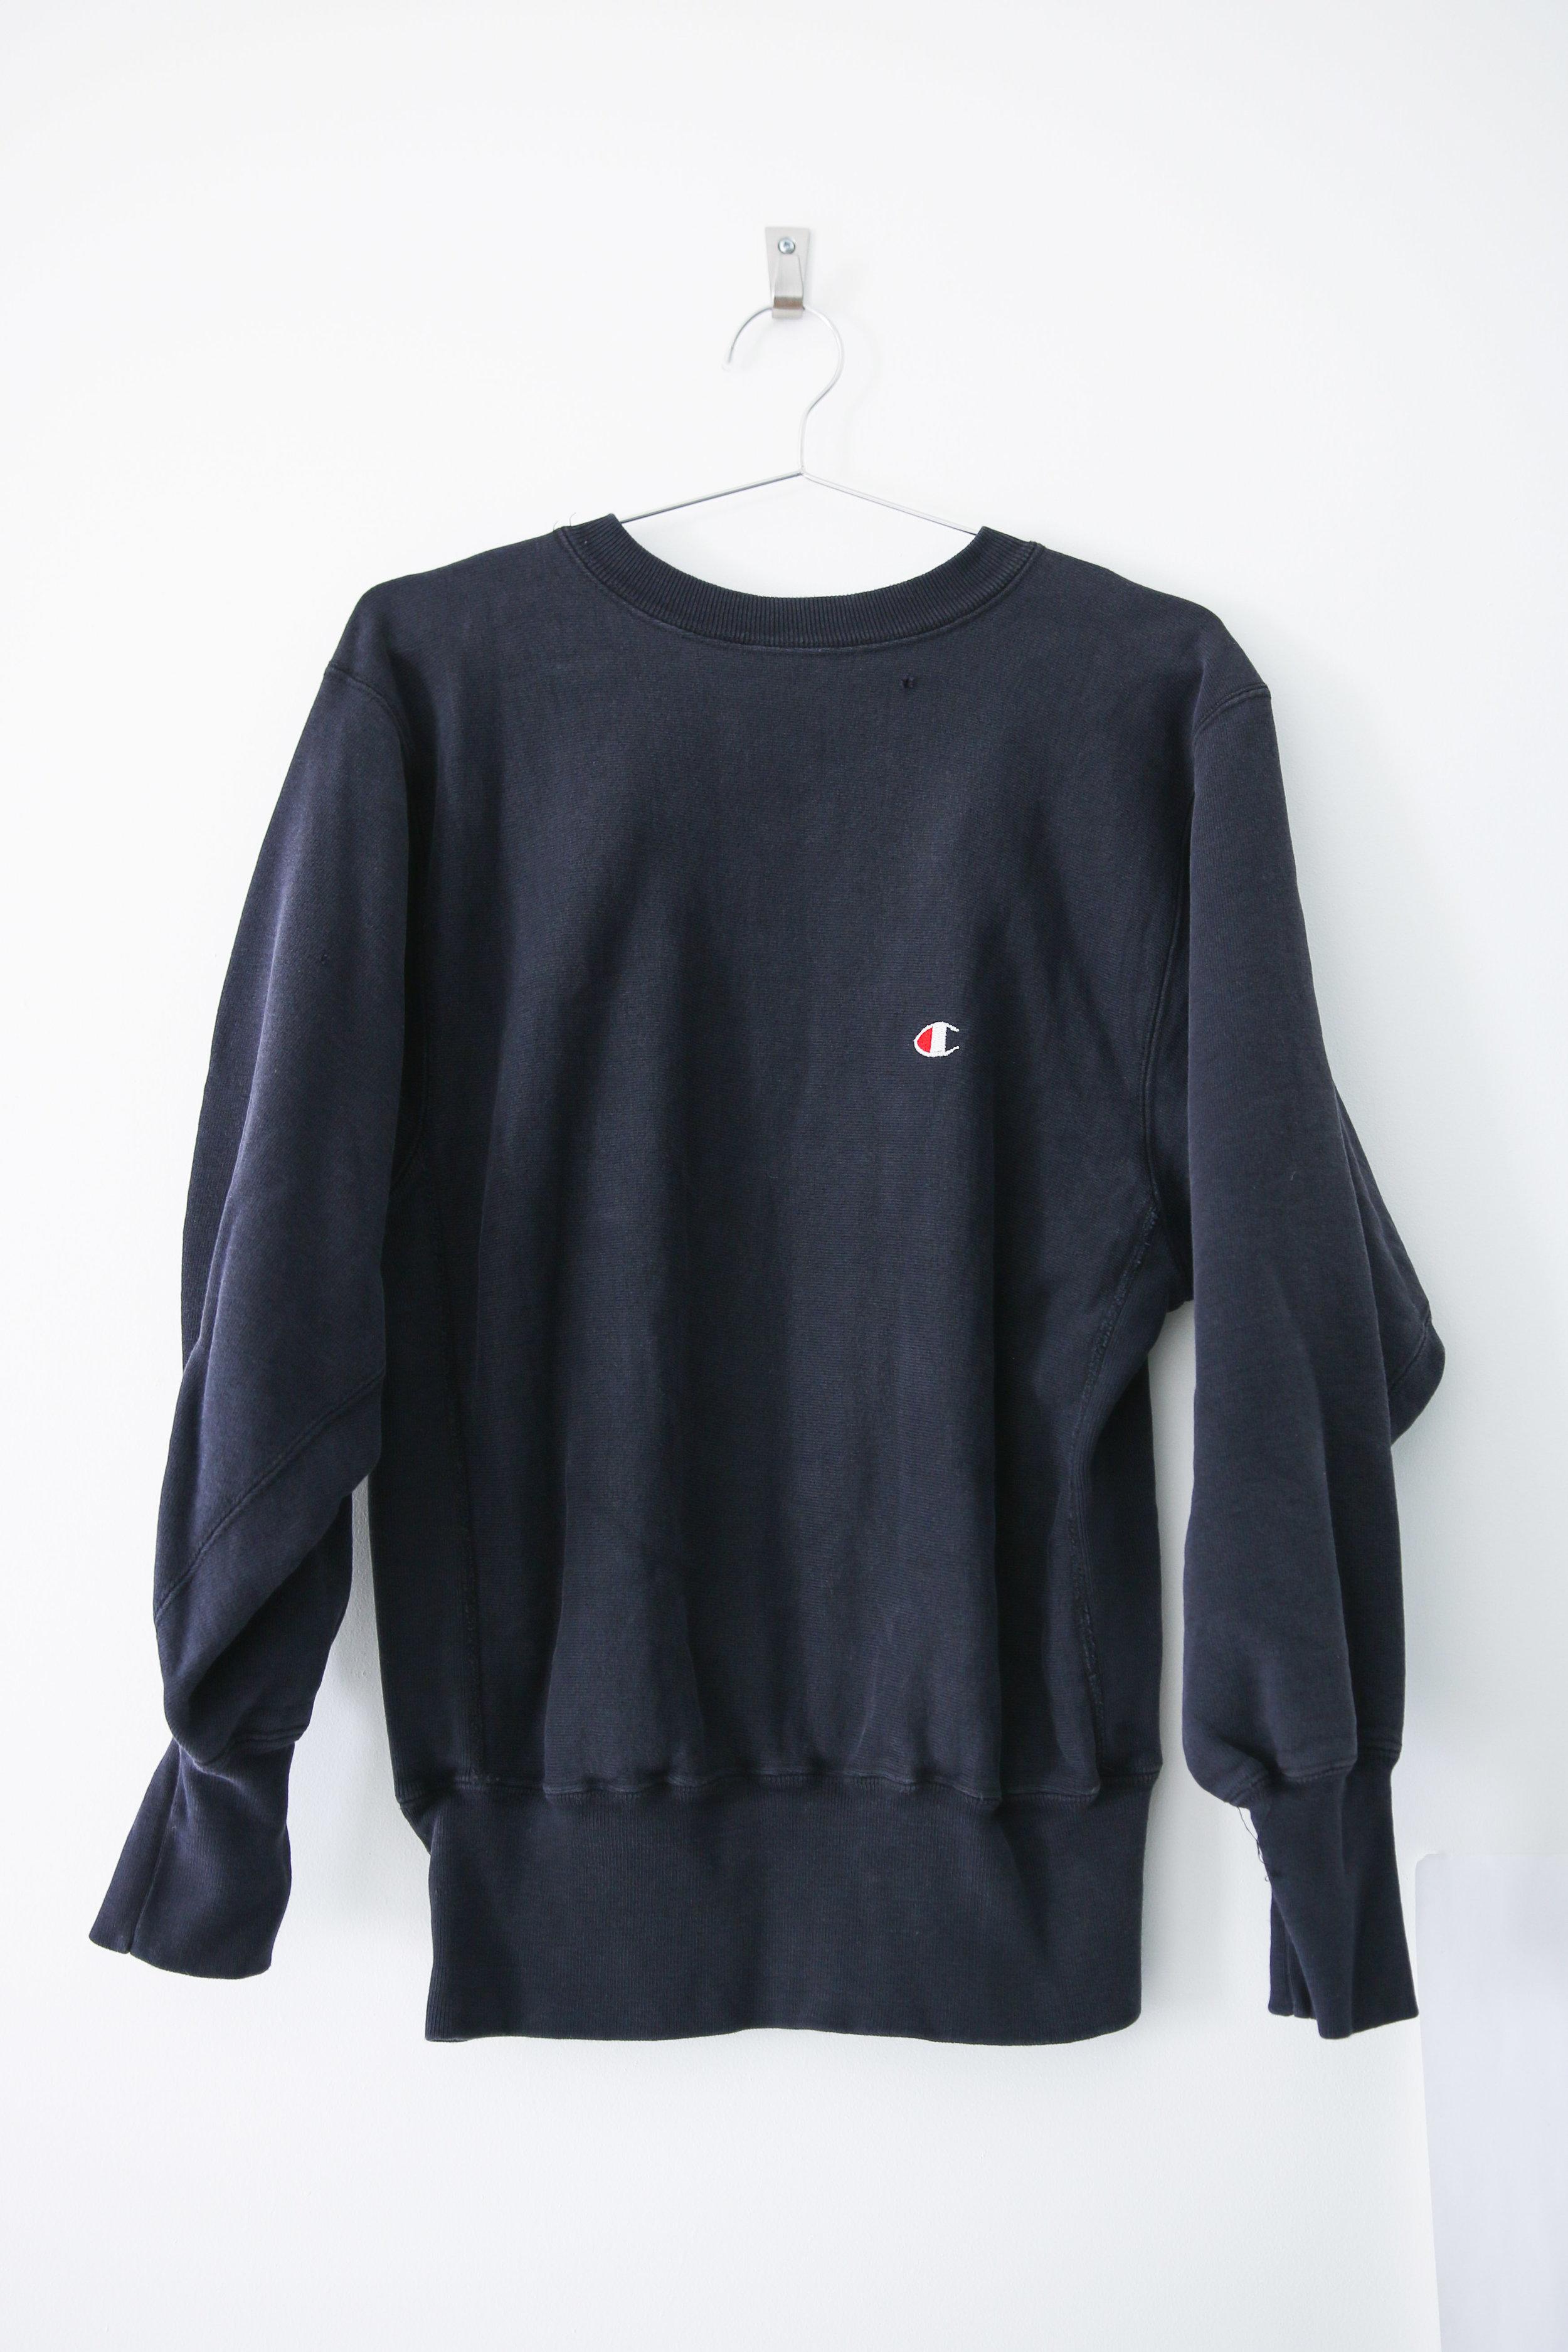 0968ea32b819 S - Vintage Champion Reverse Weave Sweatshirt - Navy. TCP - online-0833.jpg